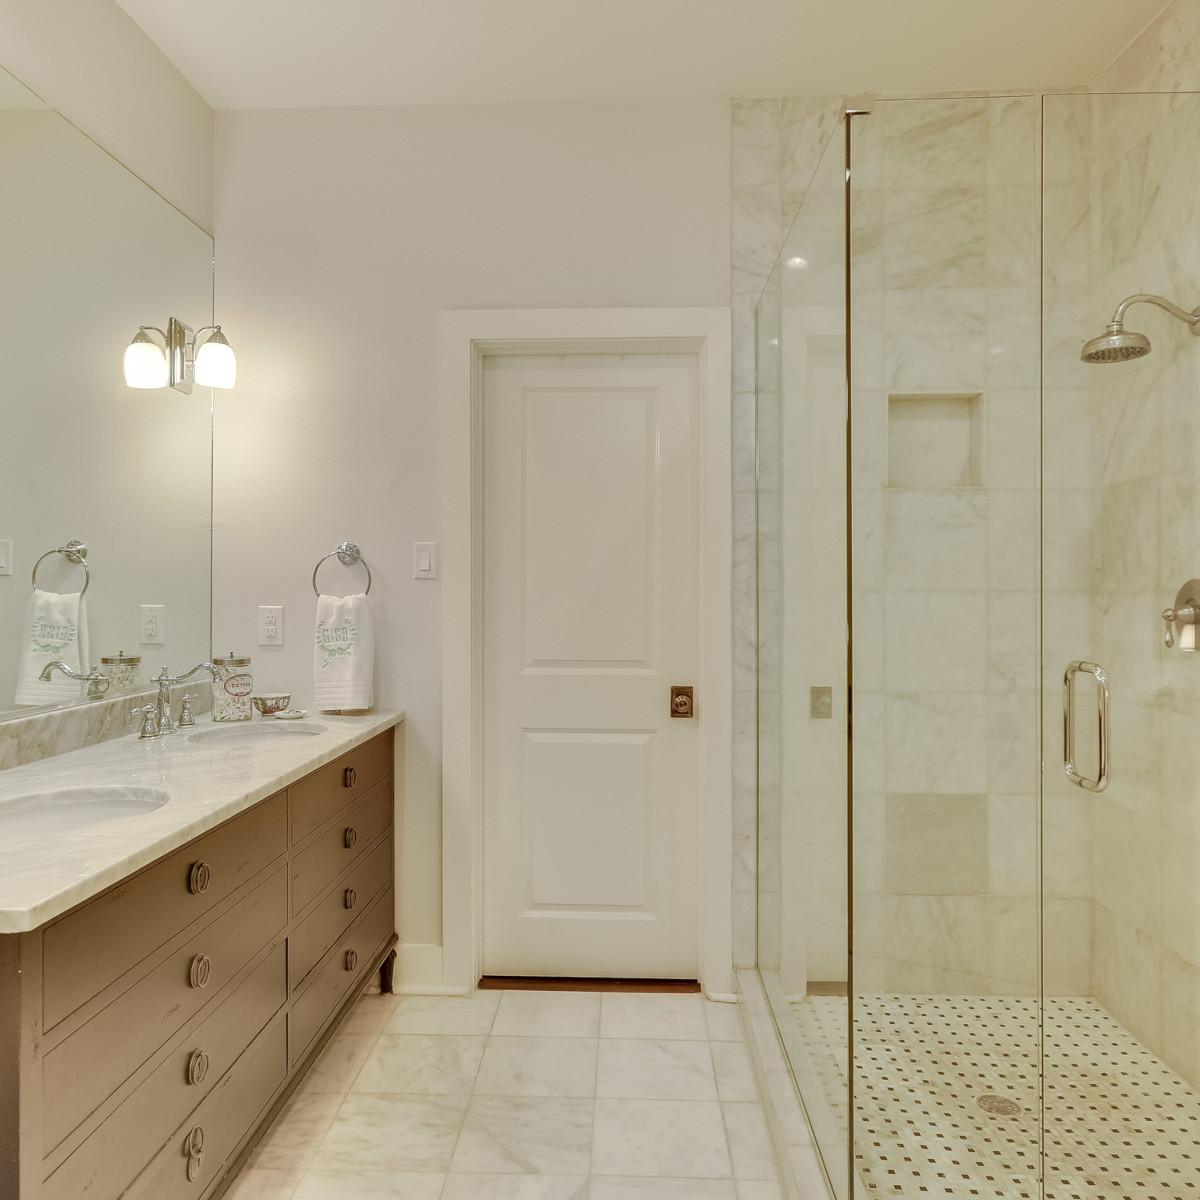 423 Queen Anne San Antonio house for sale bathroom